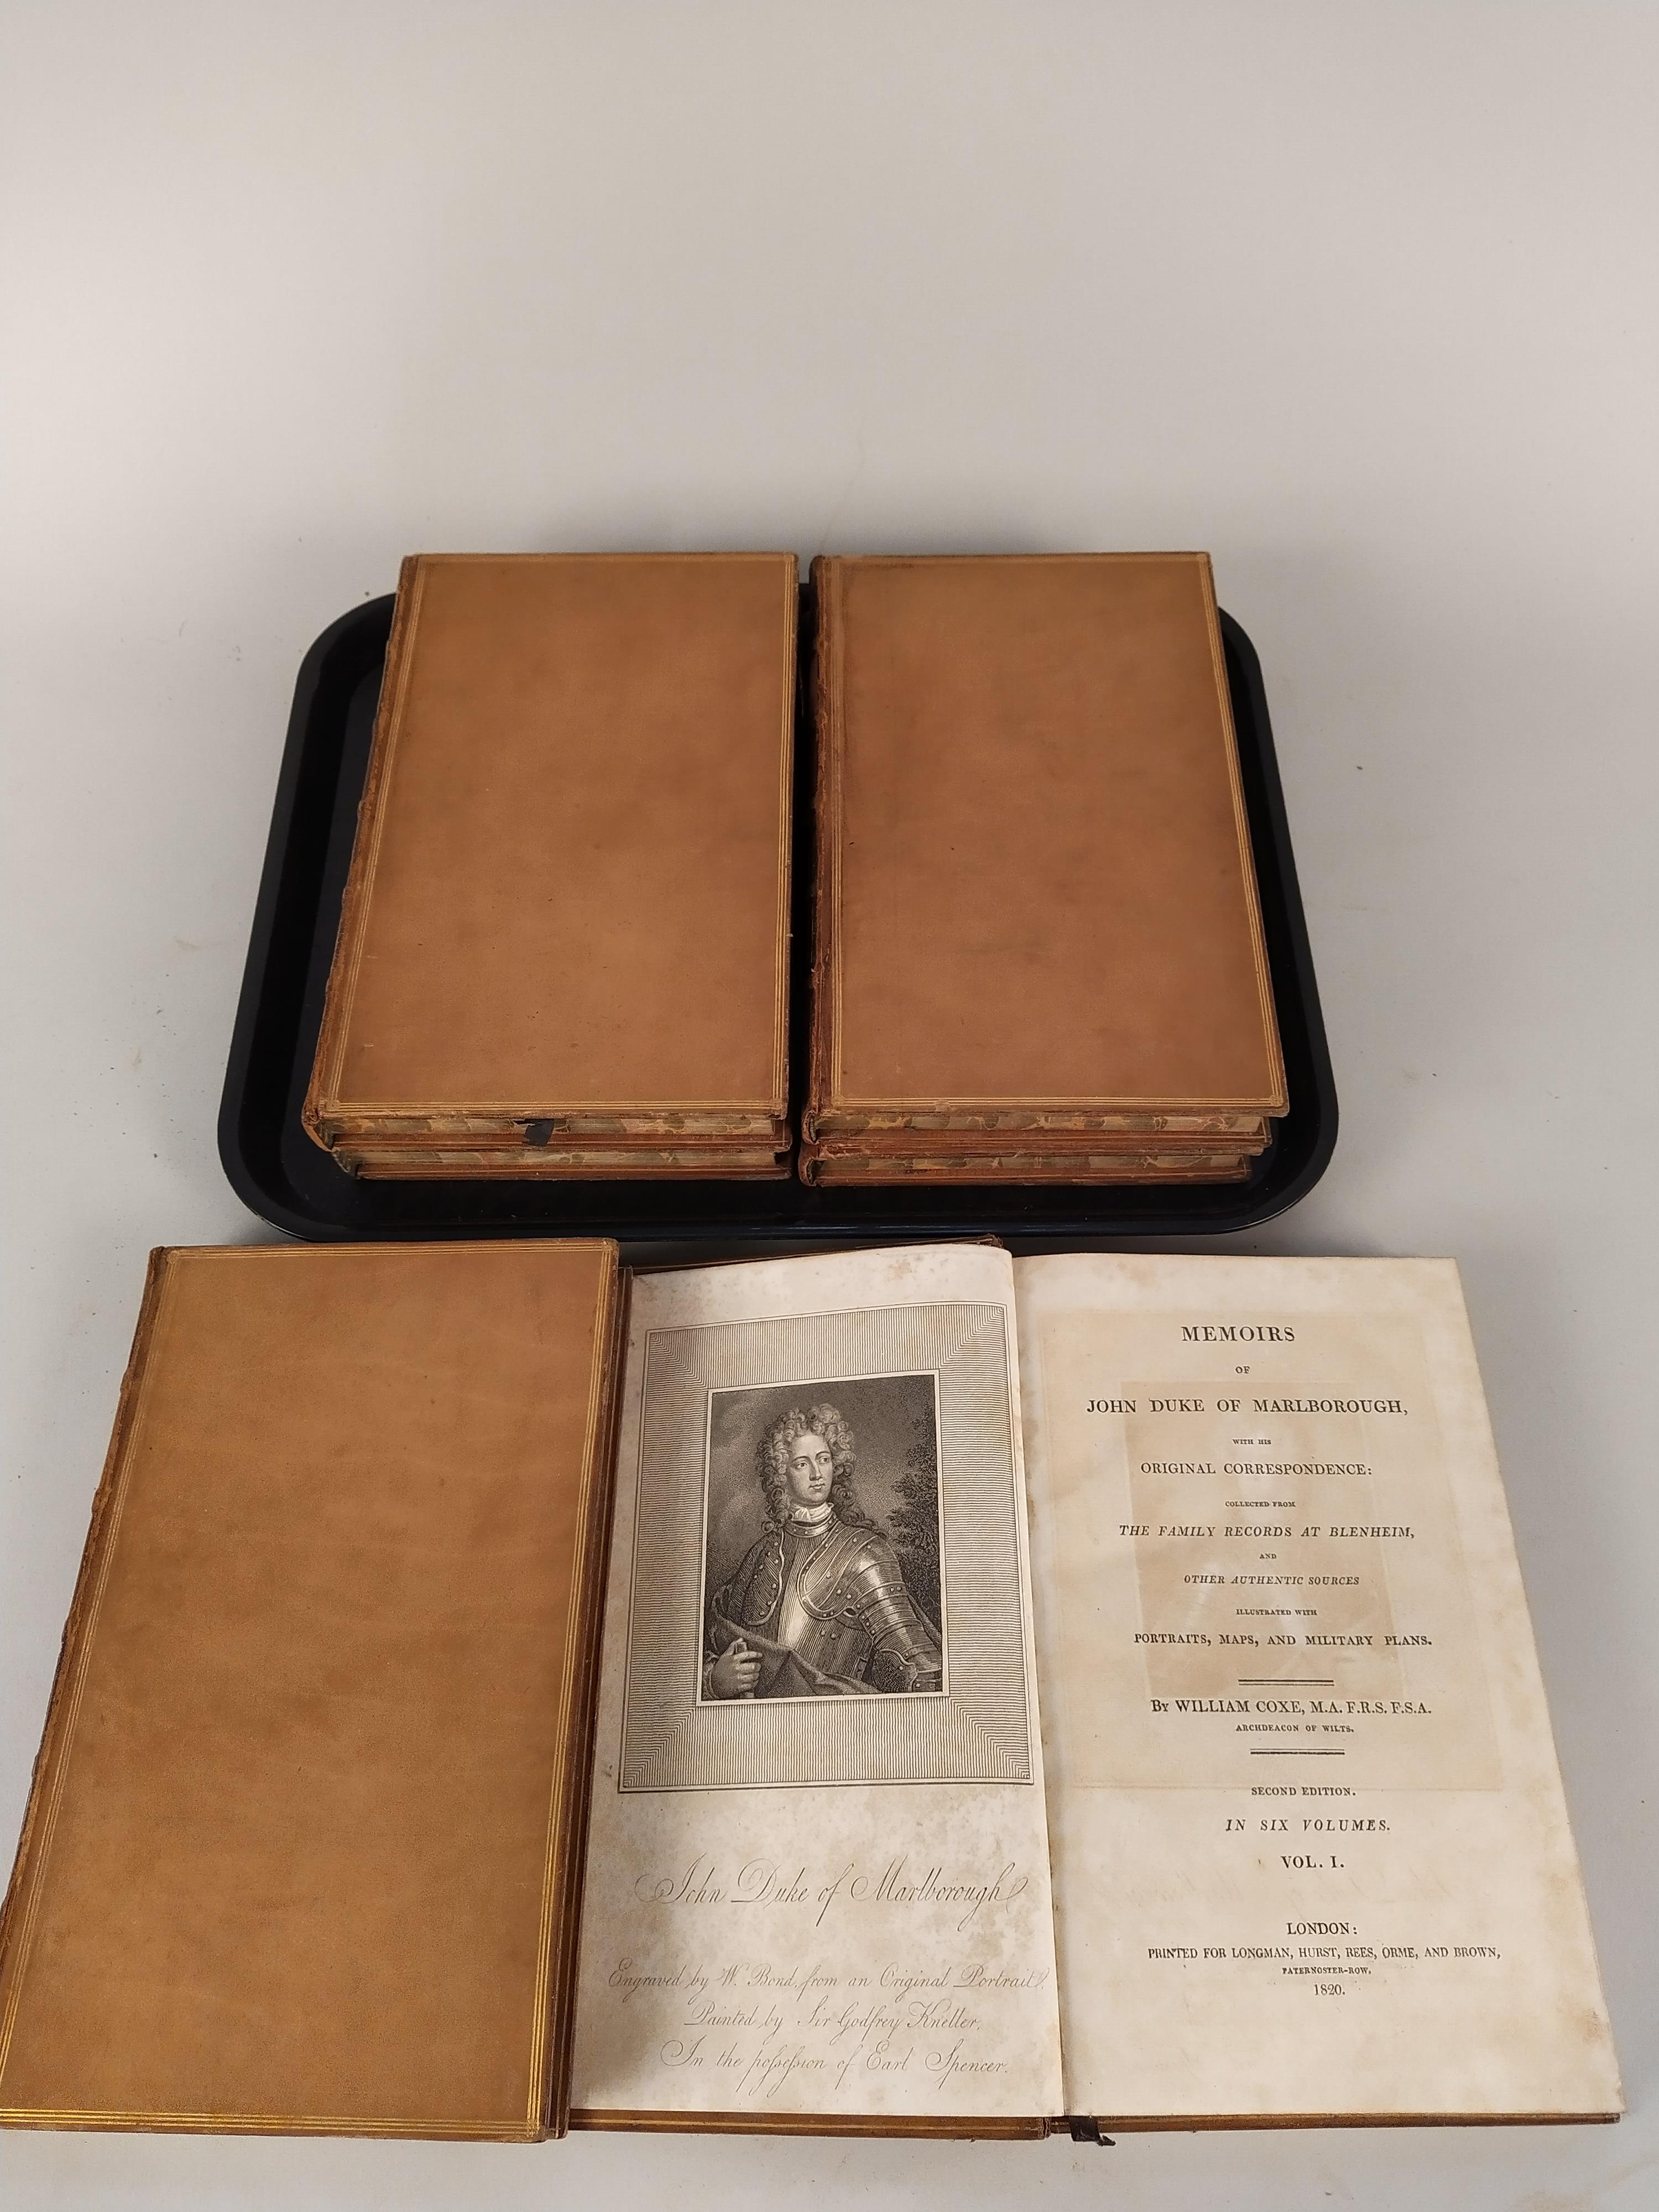 Memoirs of John, Duke of Marlborough by William Oxe, six volumes, Longman, Hurst, Rees,